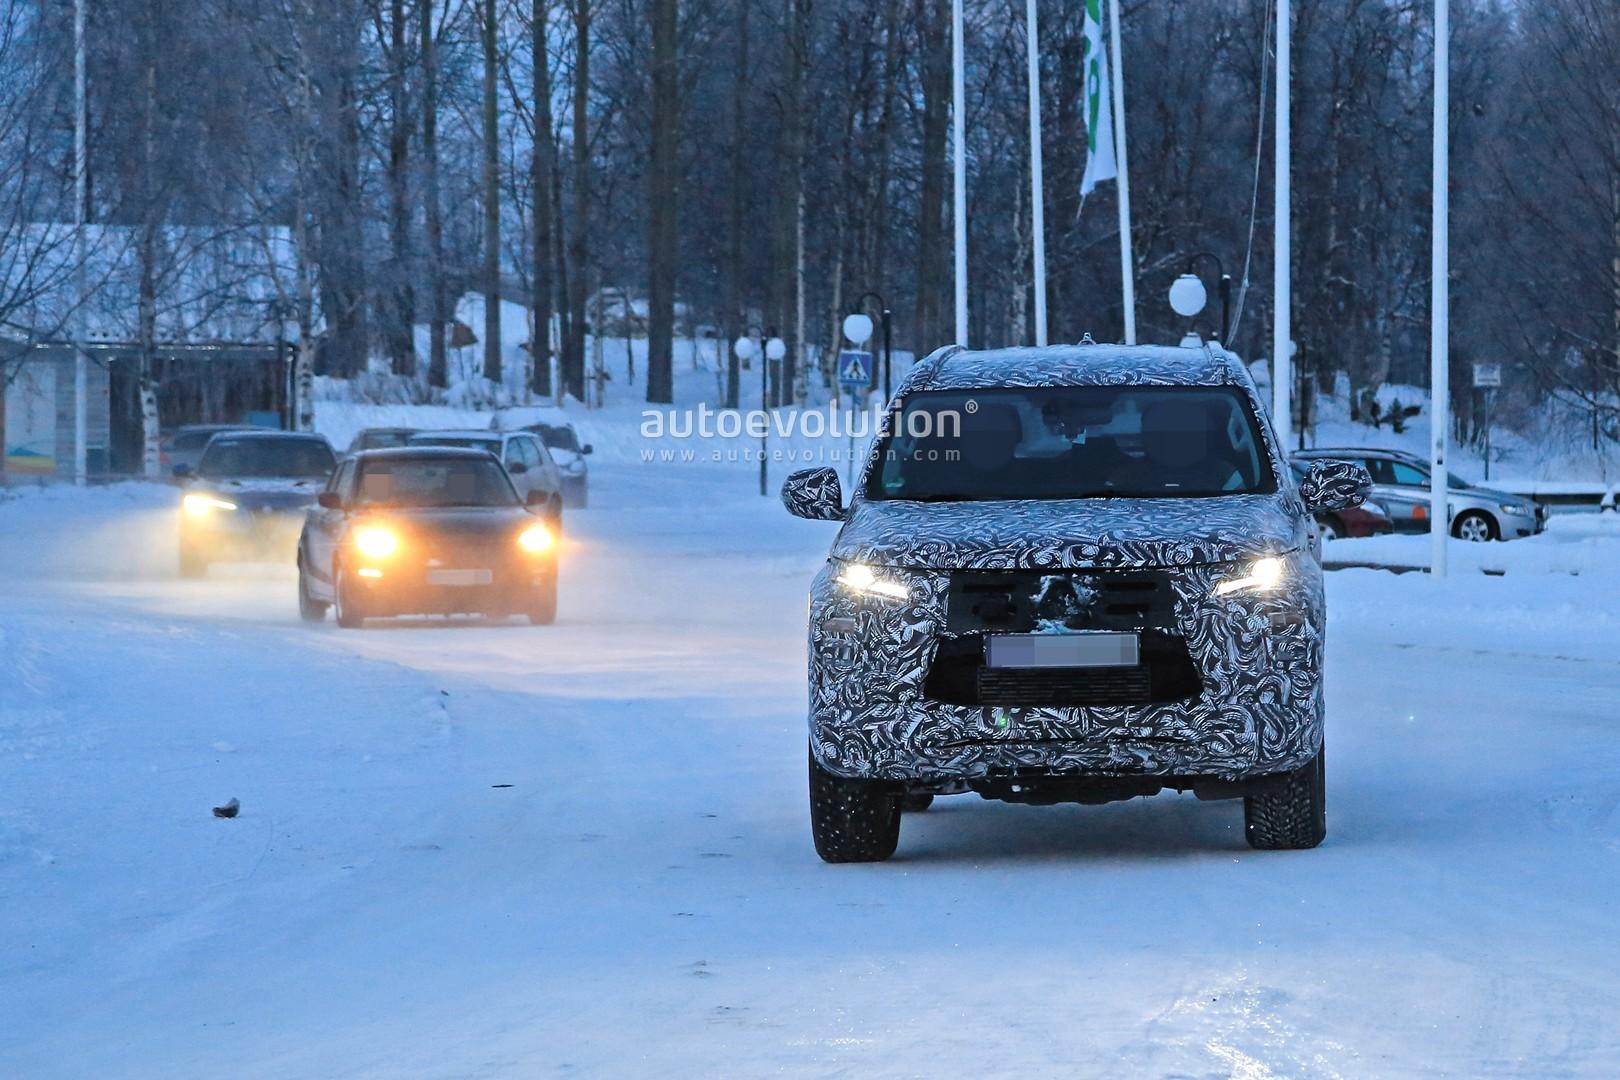 Mitsubishi to reveal electrified SUV concept at Geneva